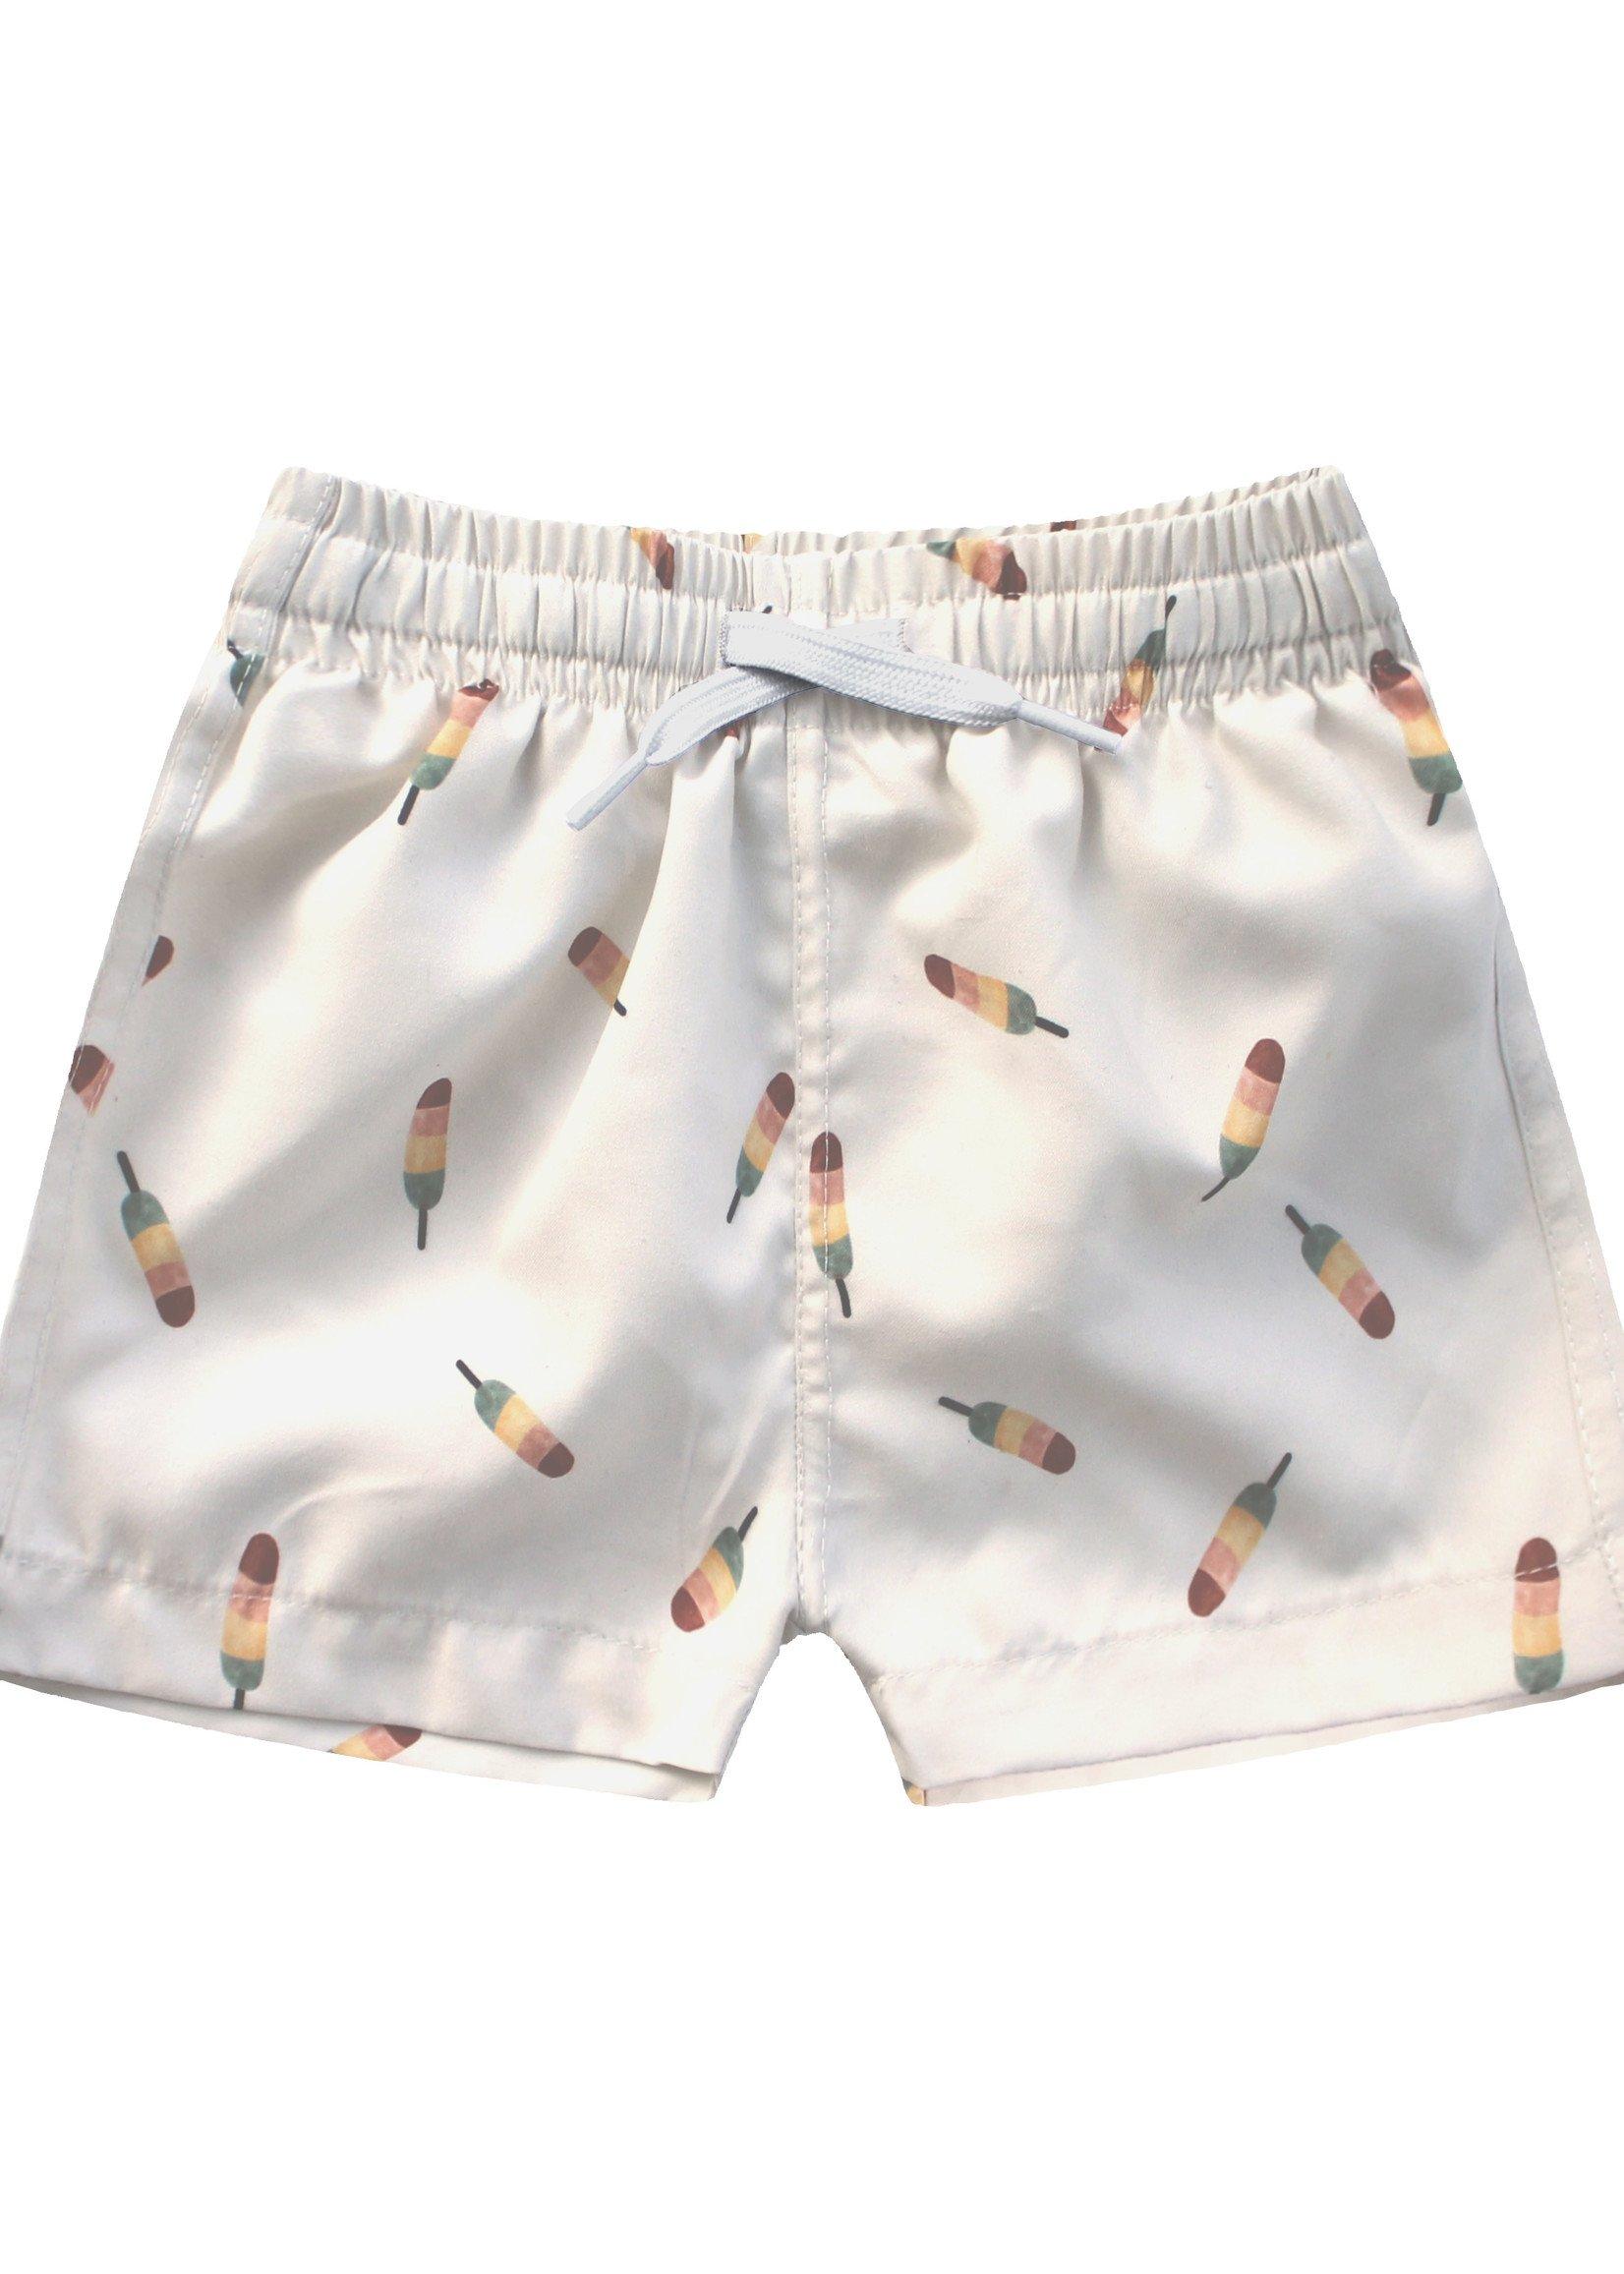 Your Wishes YW - Ice Cream   Swim Shorts